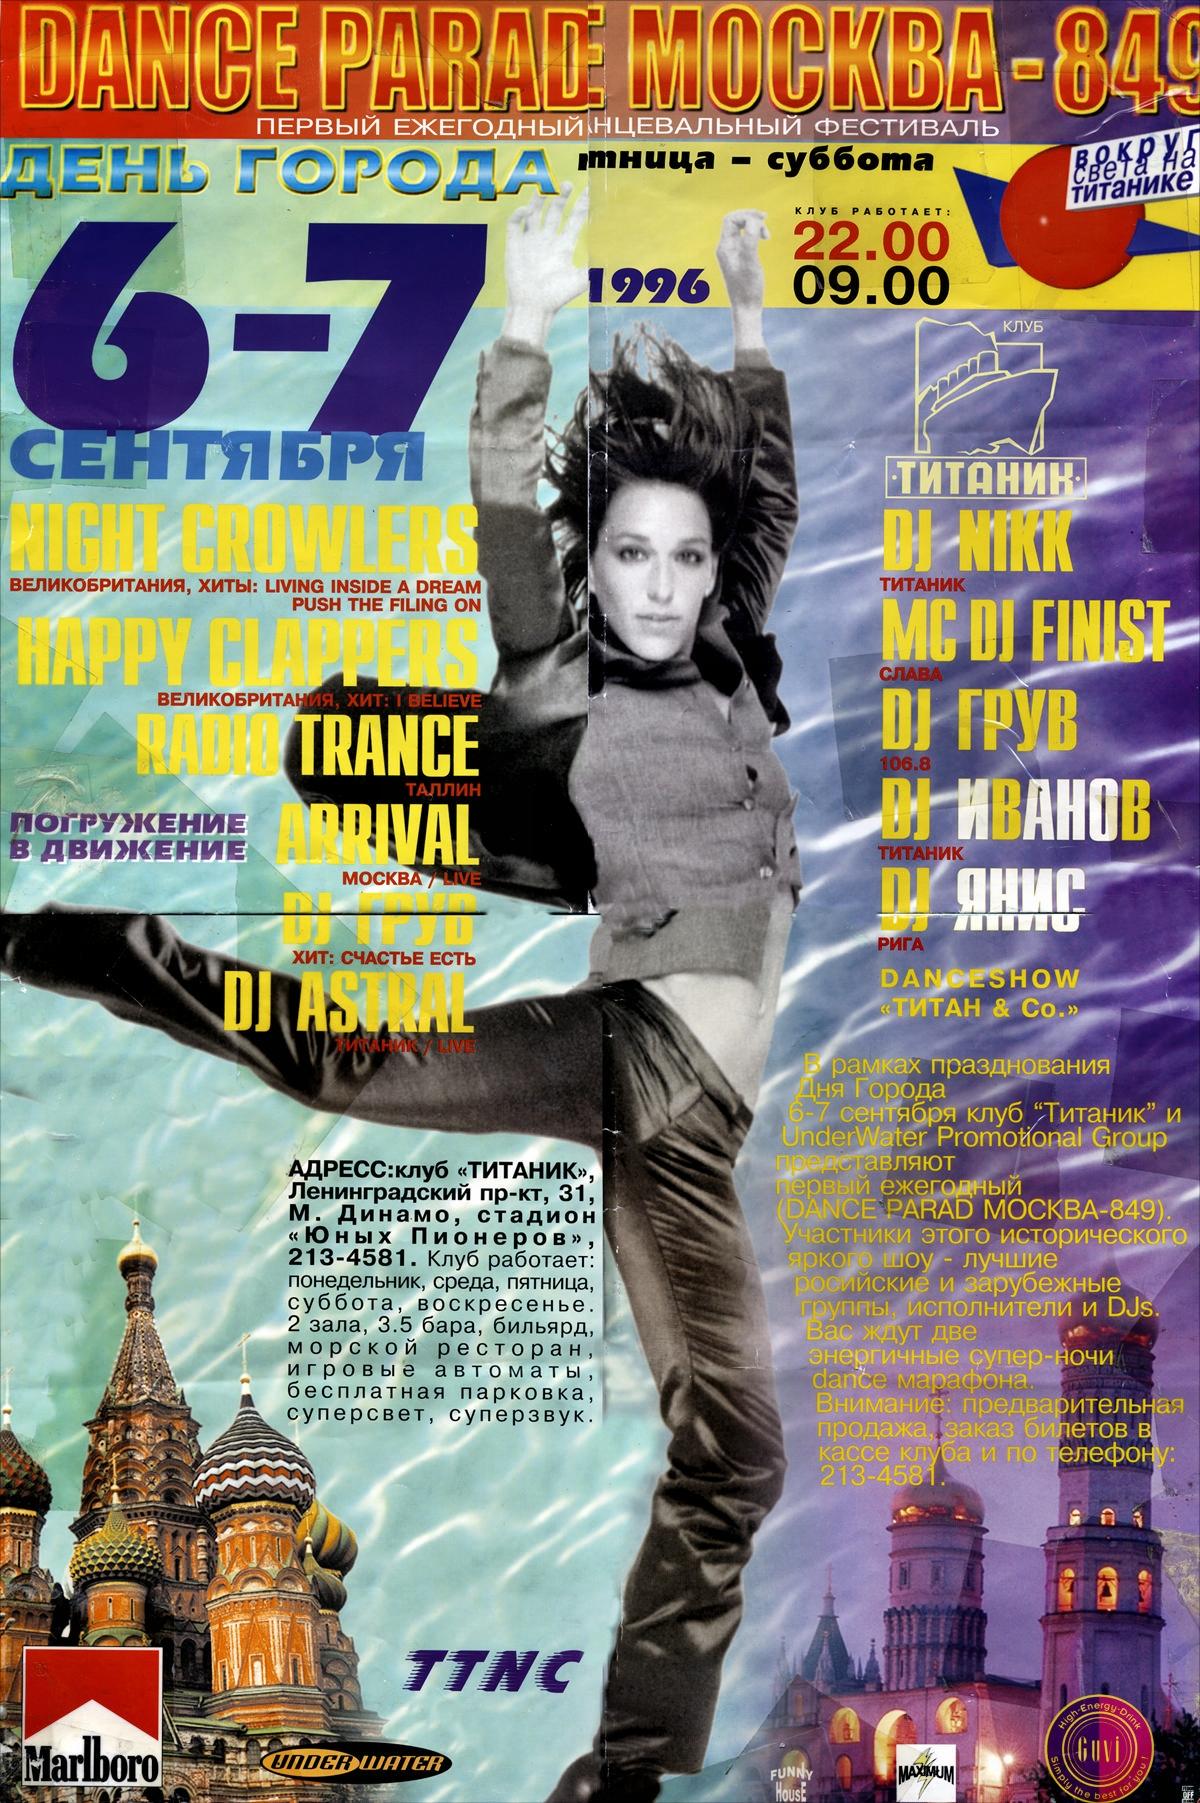 DanceParadeMoscow849_Titanic club.jpg